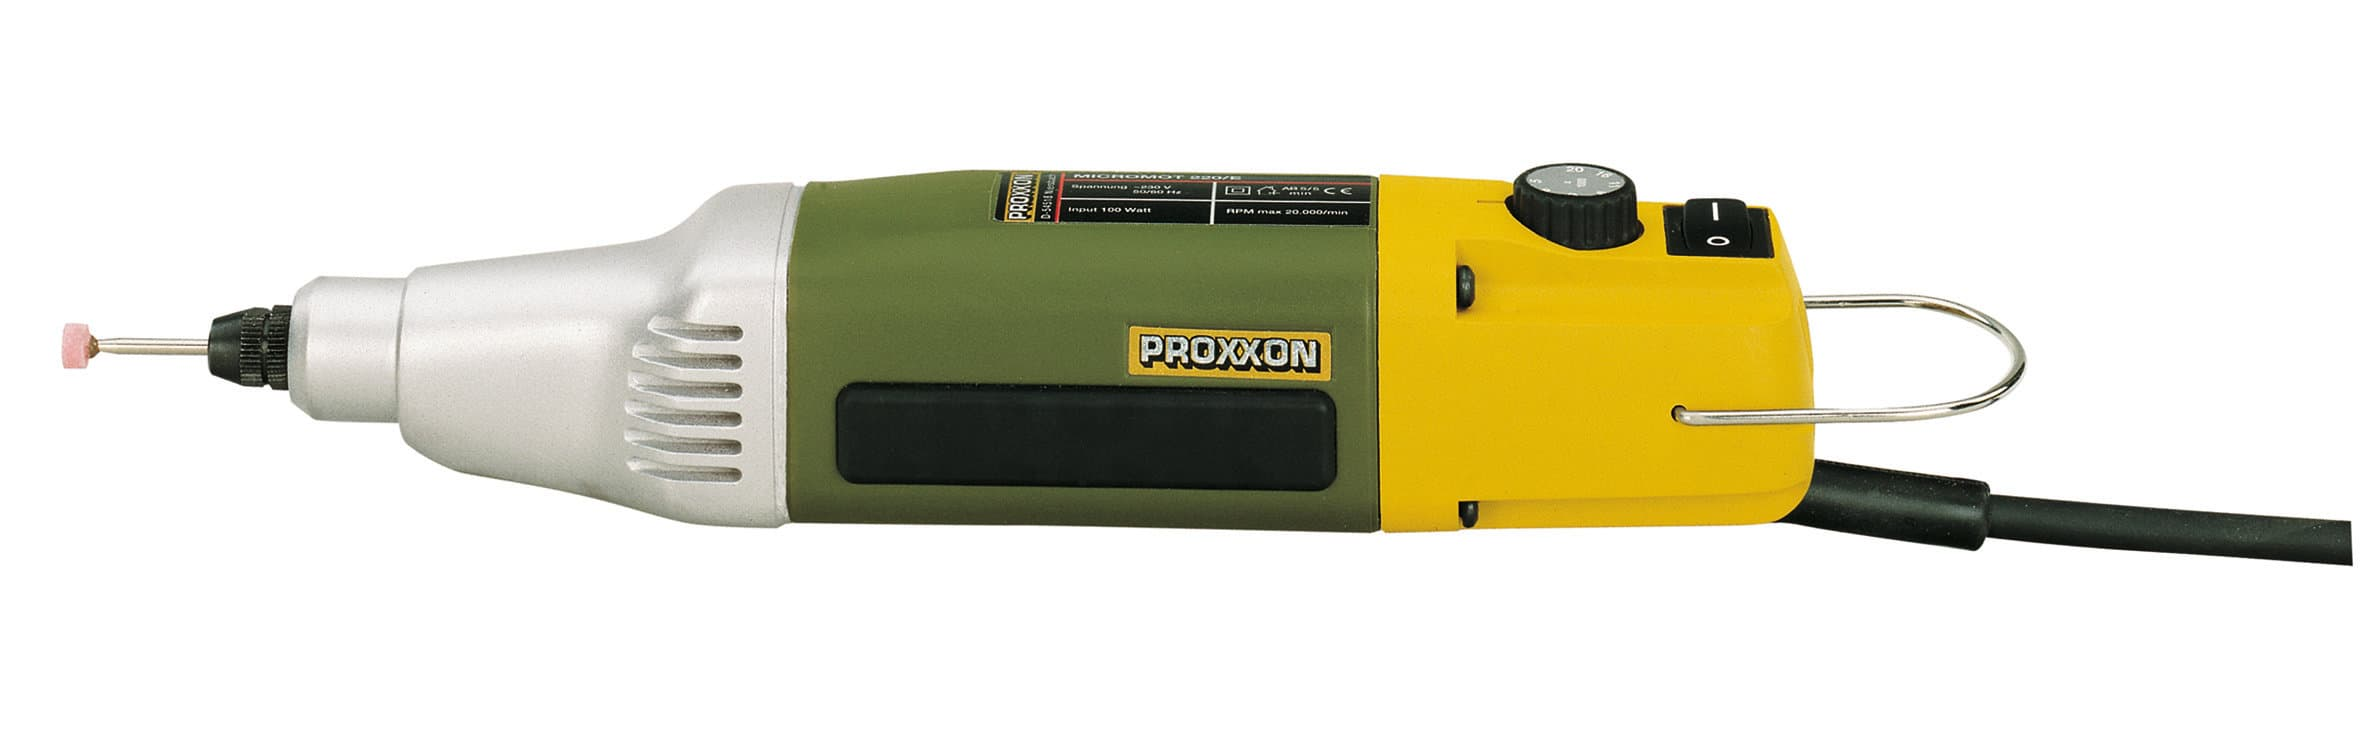 Proxxon MICROMOT Trapano fresatore IB/E